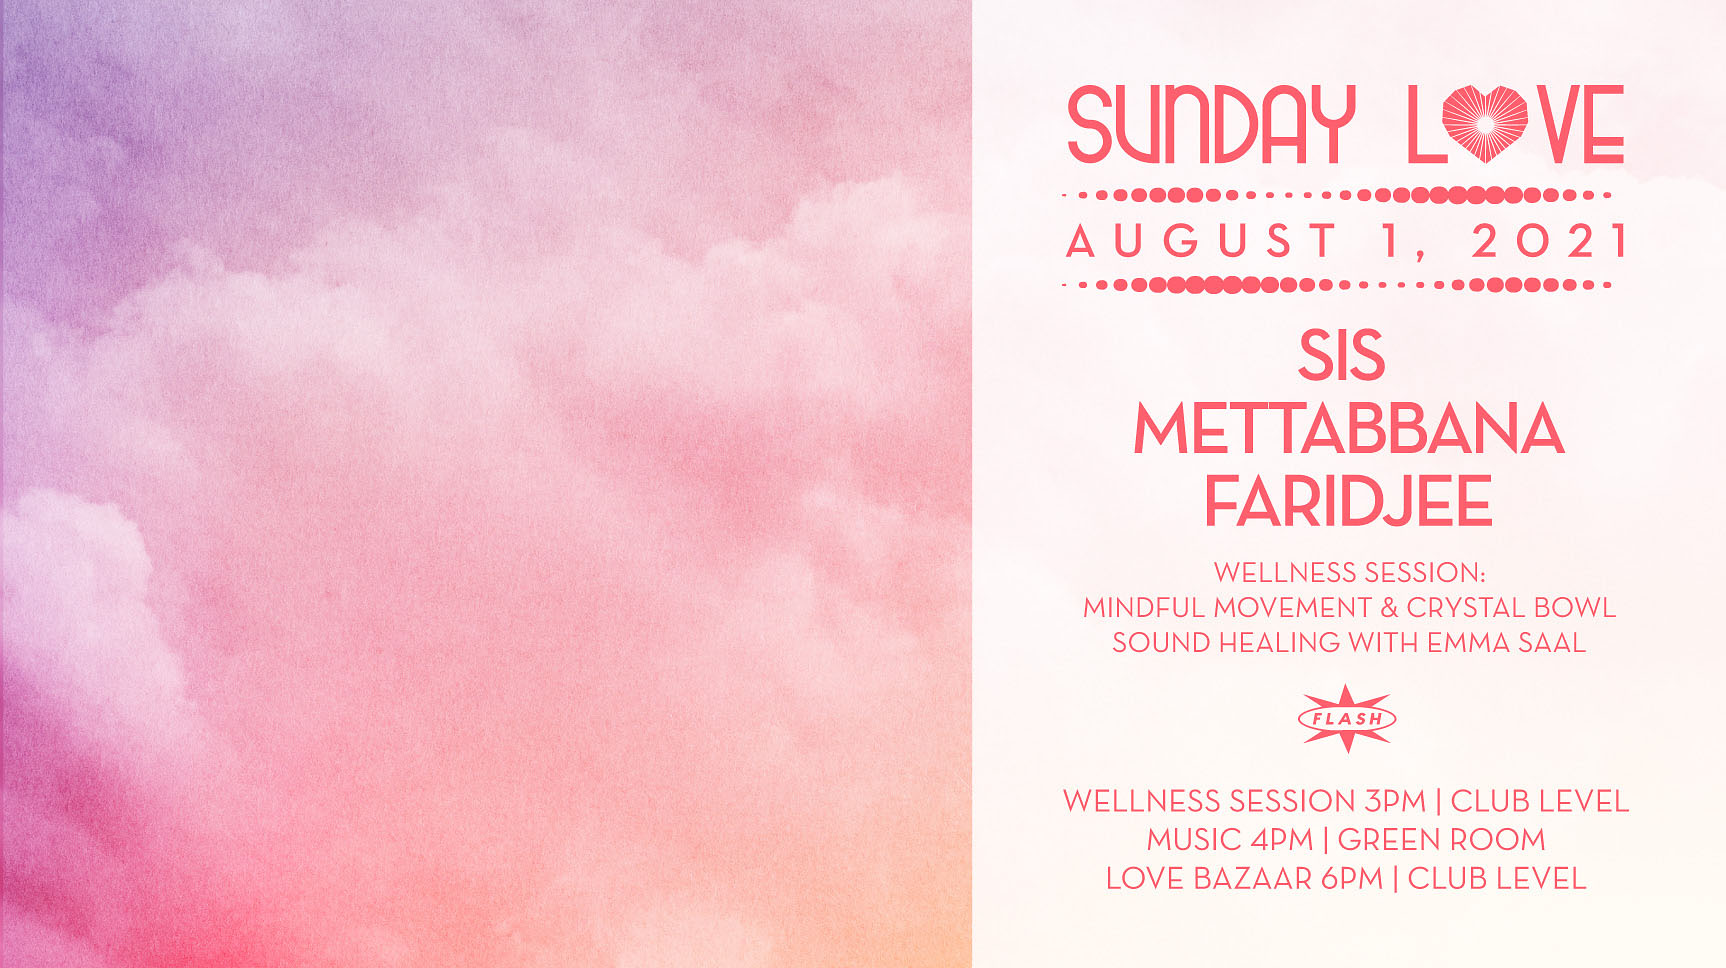 Sunday Love: Sis - Mettabbana - Faridjee